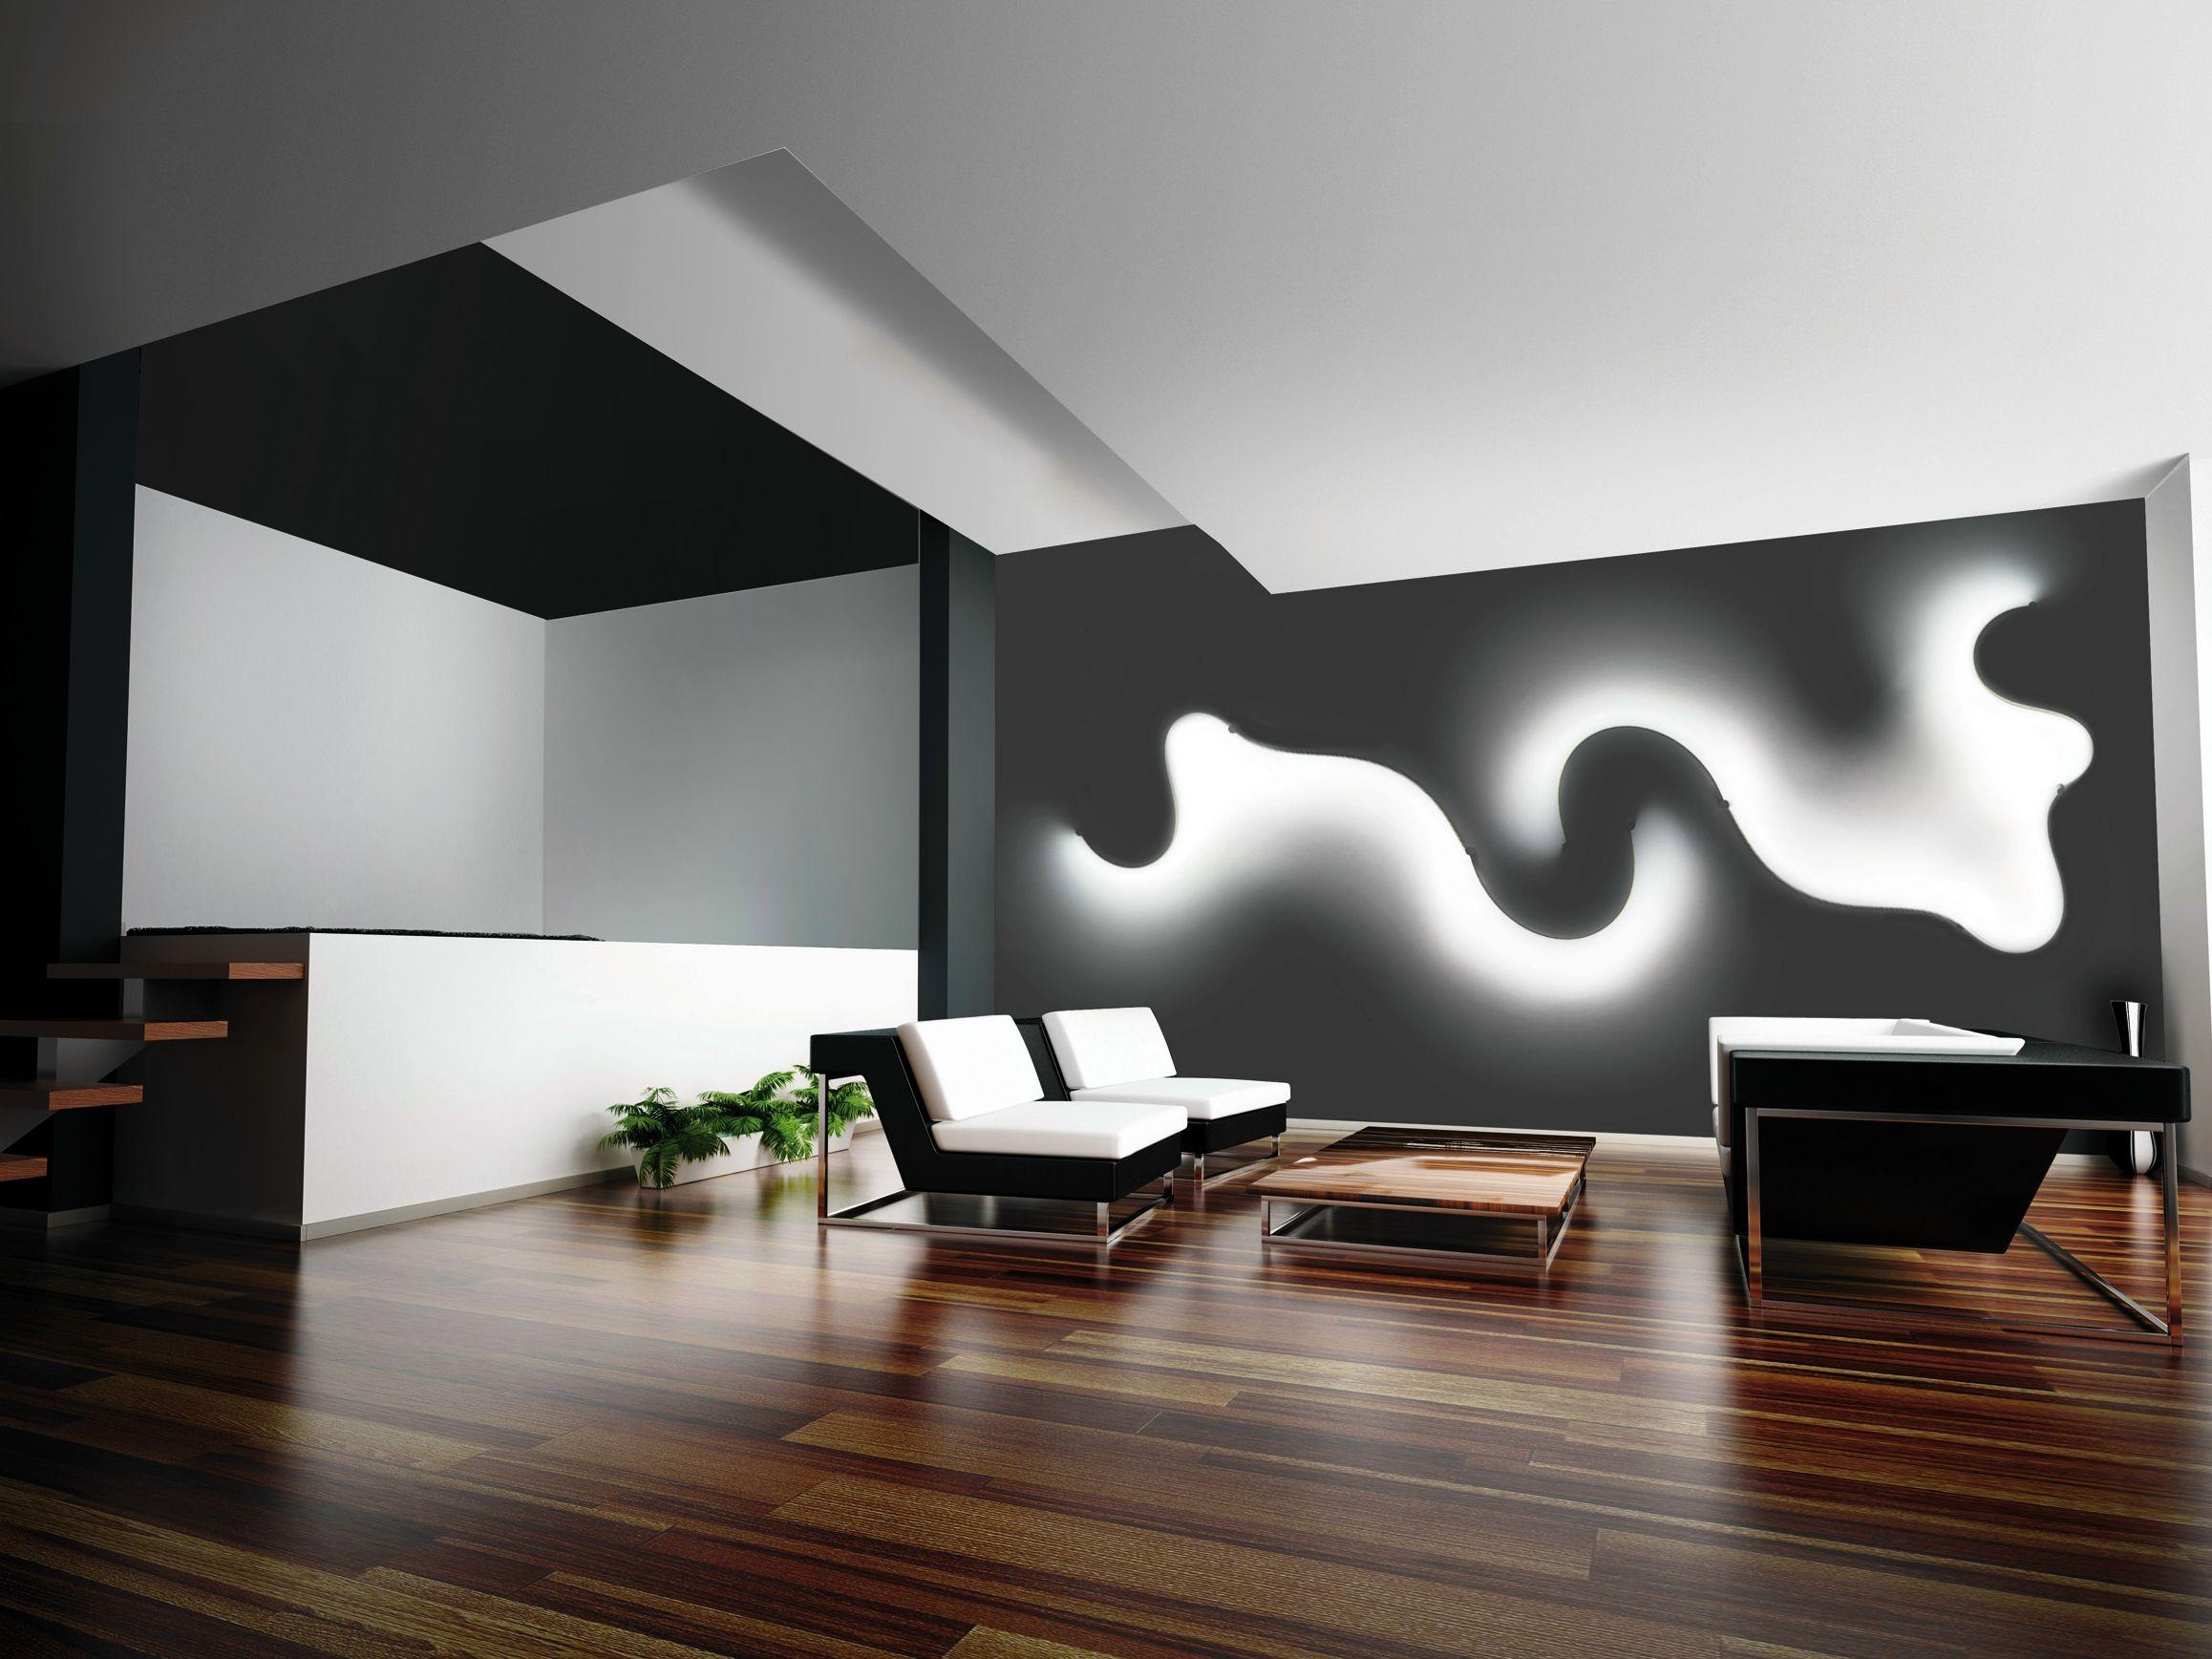 Formala plus 4 walls lights and corian formala plus 4 aloadofball Images